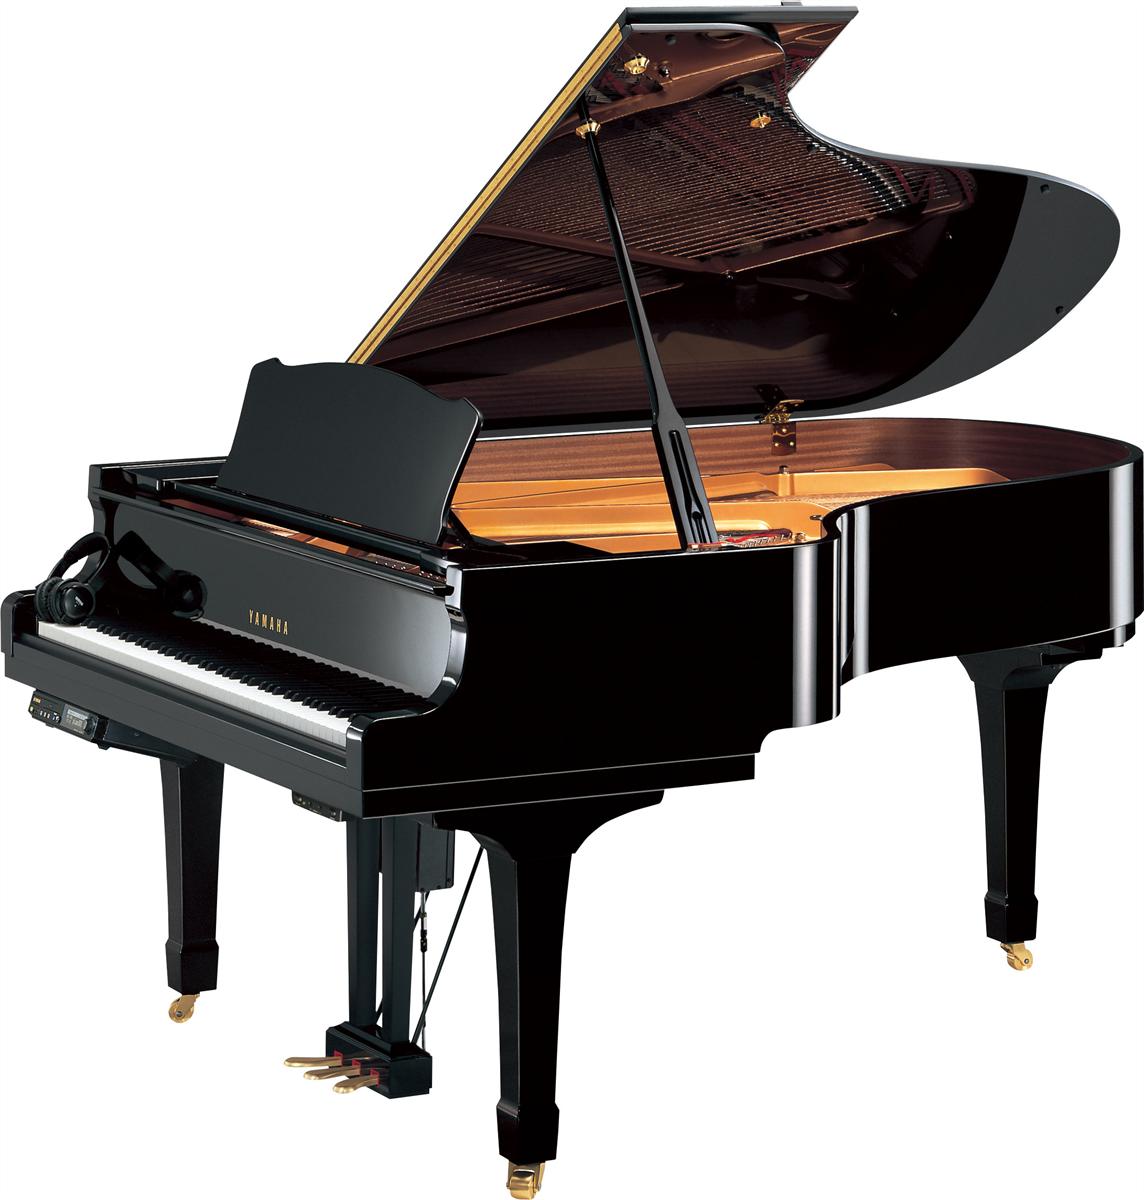 Yamaha DC5X ENSPIRE PRO Disklavier™ Grand Piano